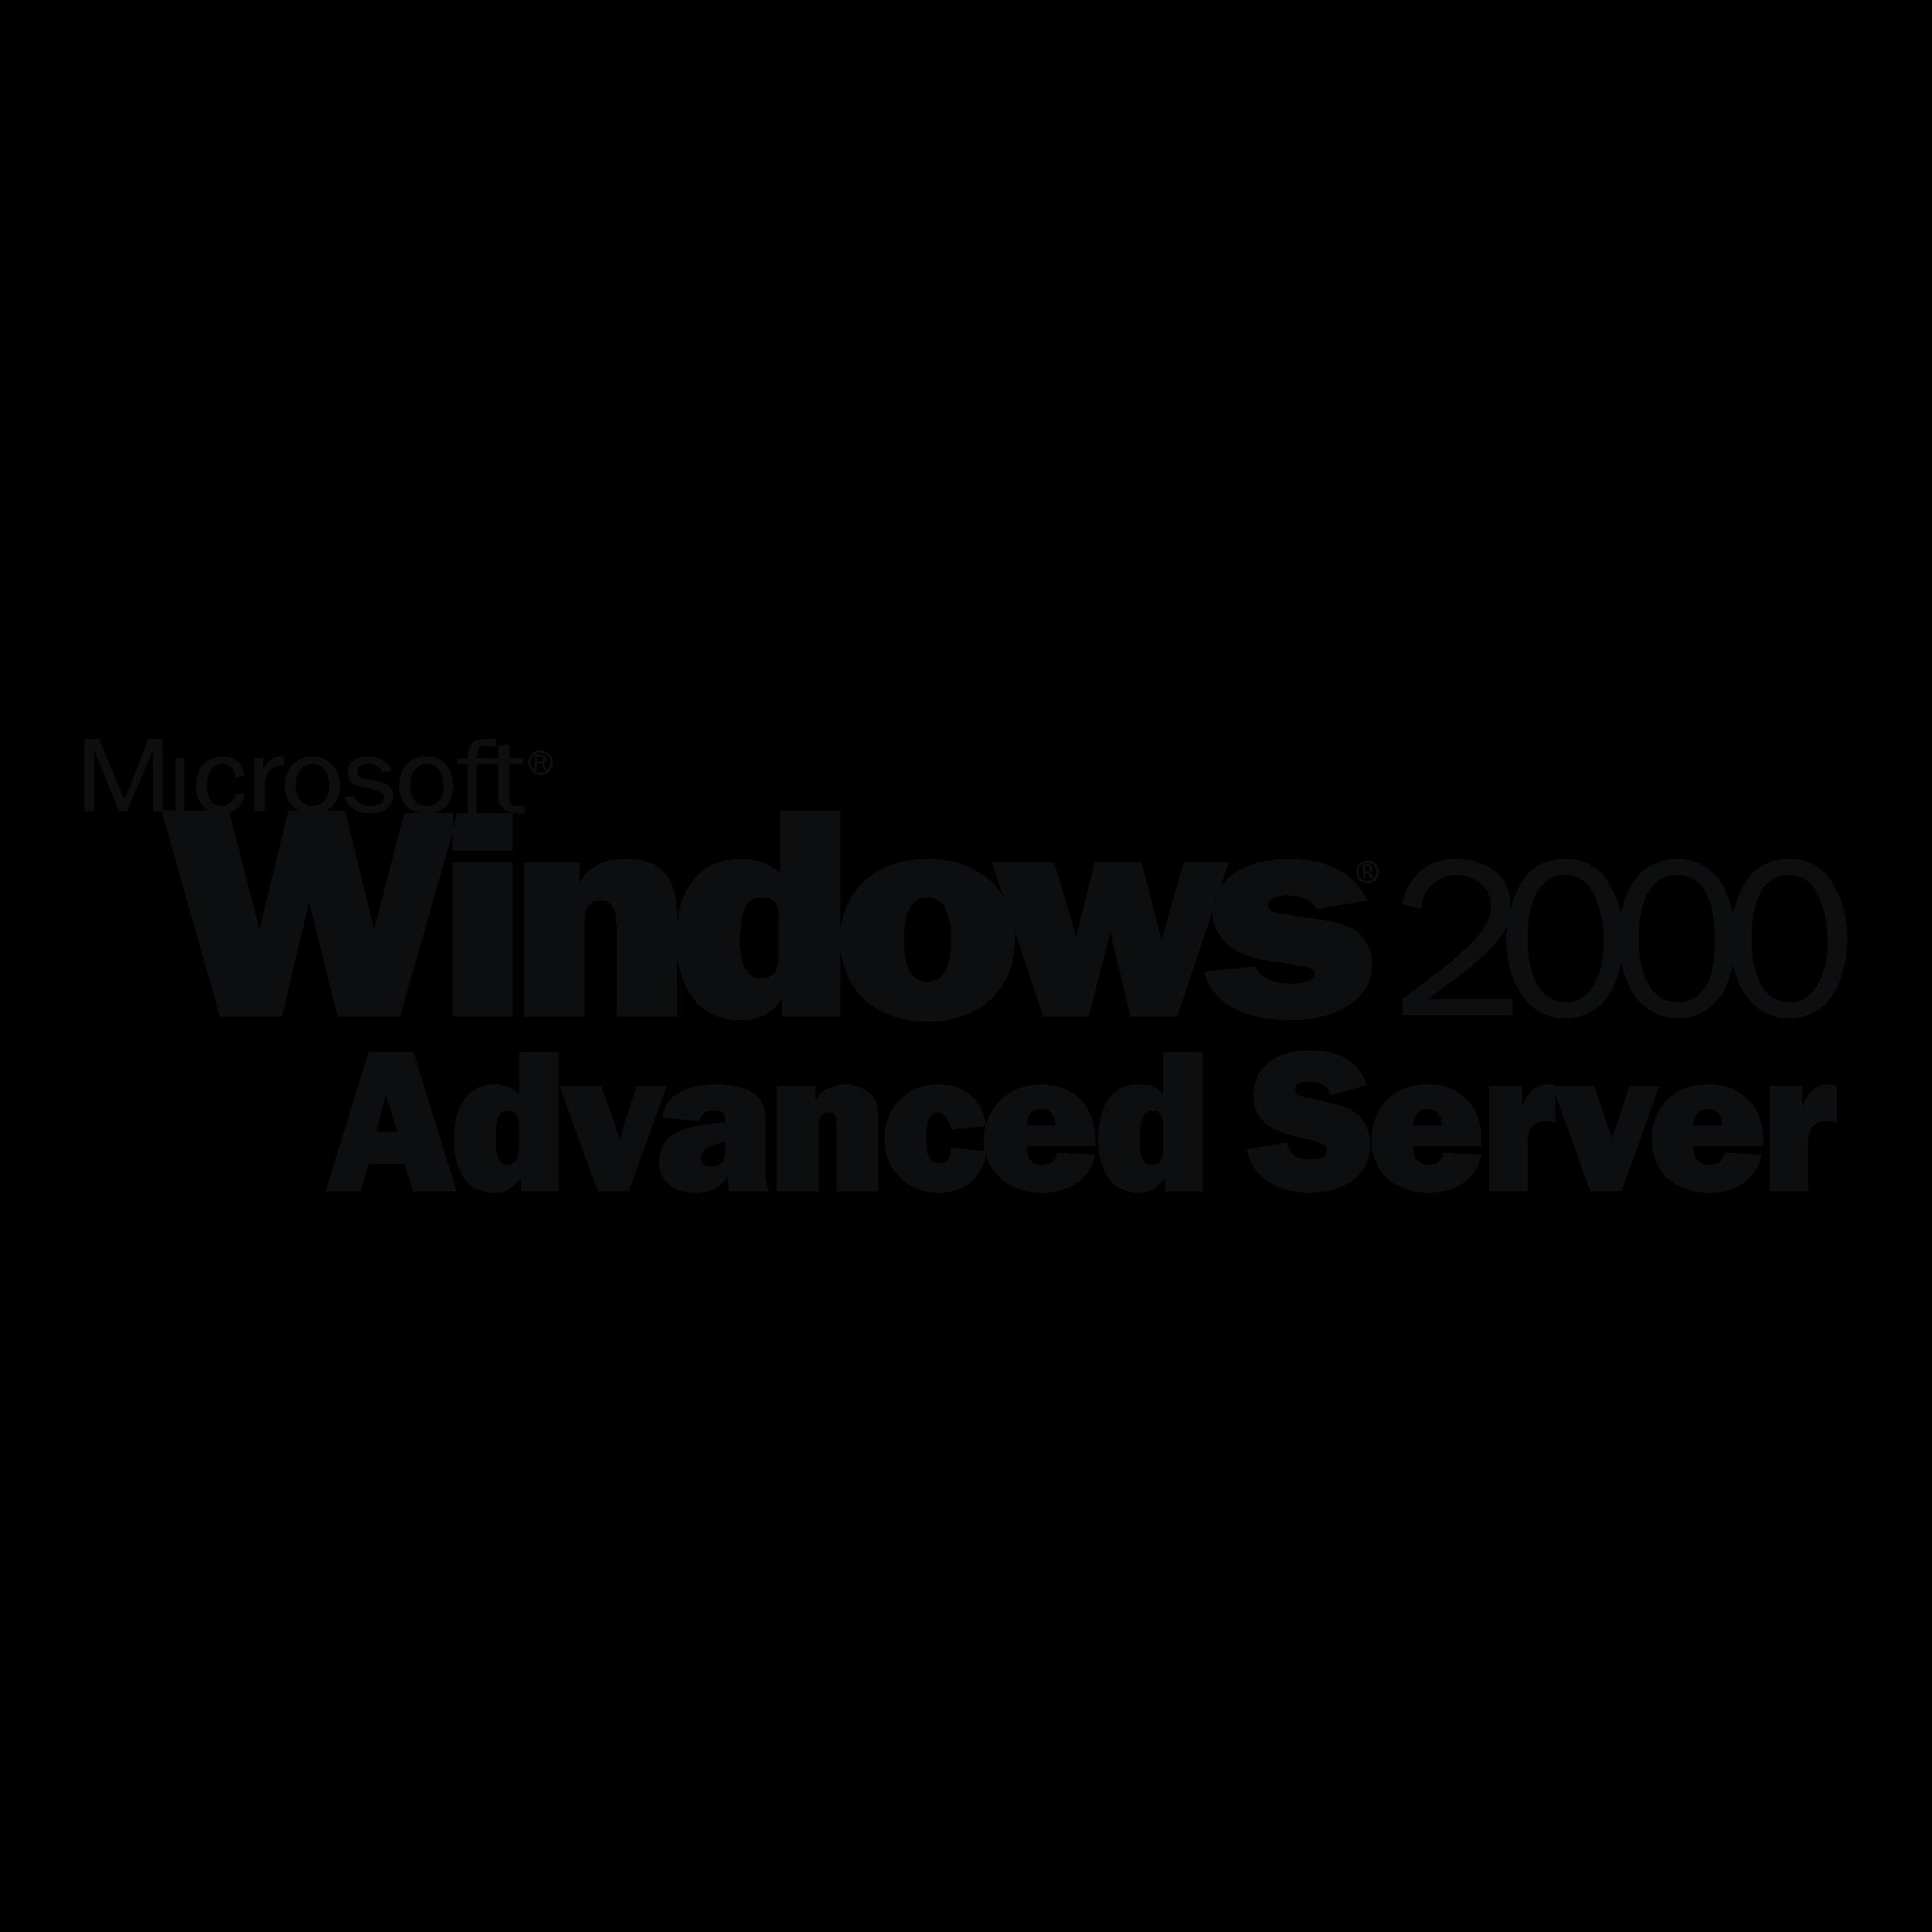 Microsoft Windows 2000 Advanced Server Logo PNG Transparent